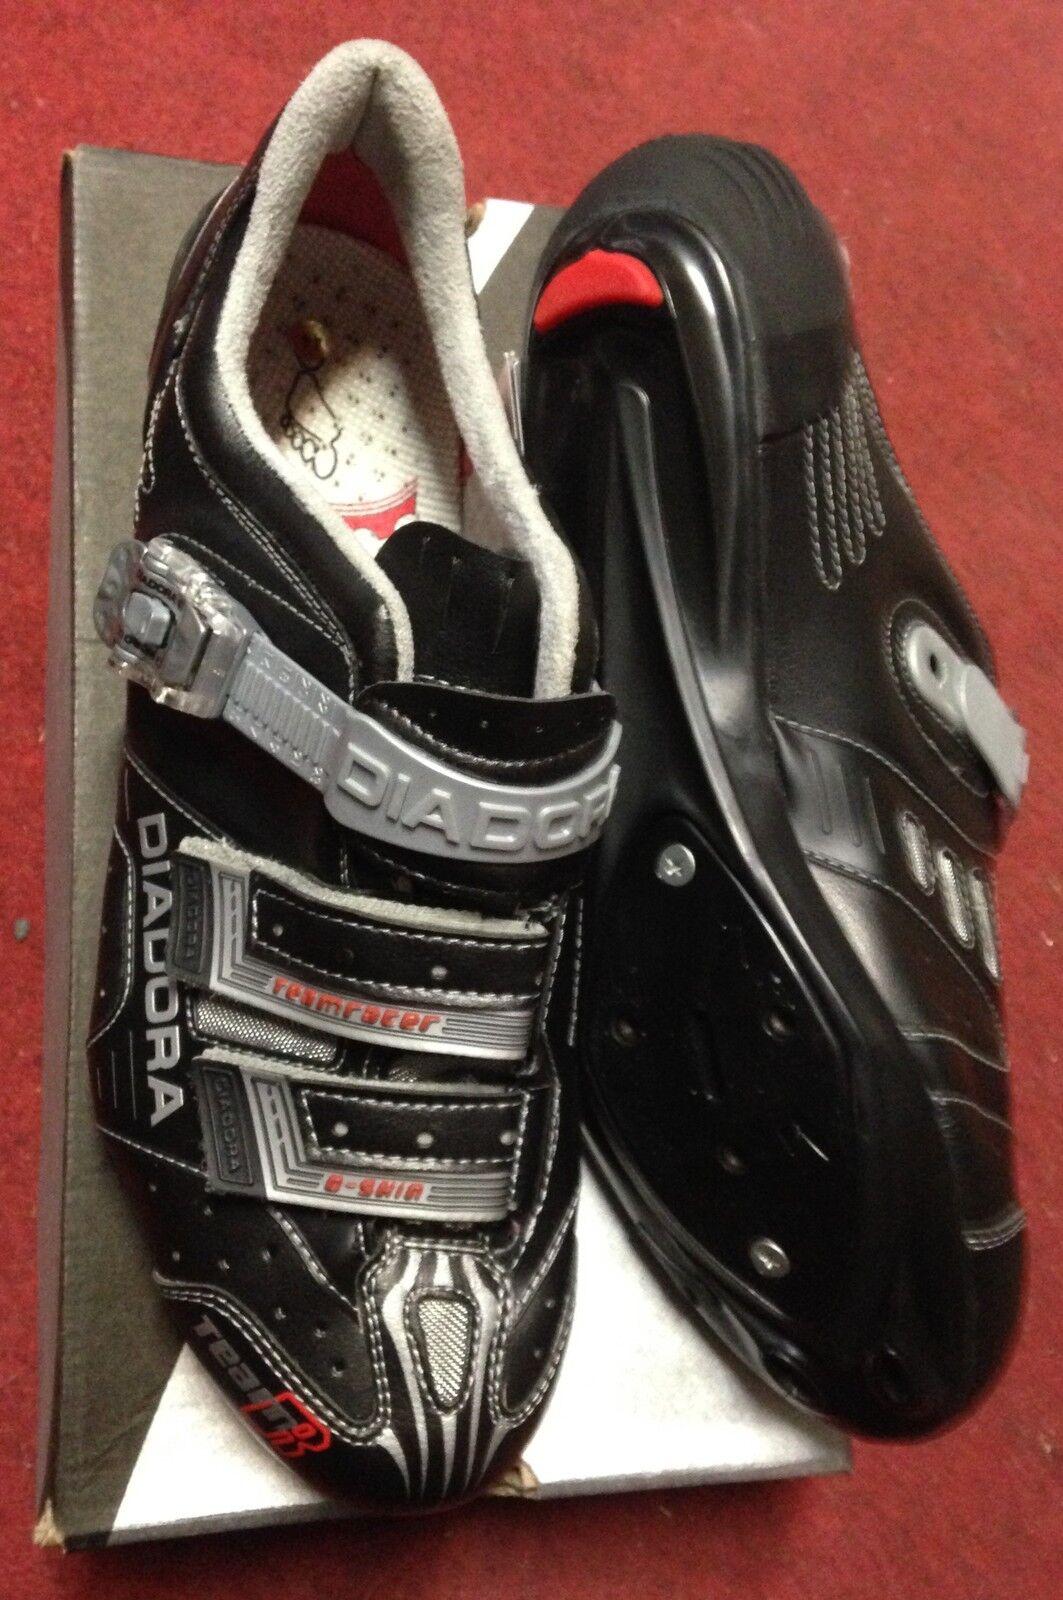 shoes bici corsa Diadora Team Racer Magnum 38-45 road bike shoes